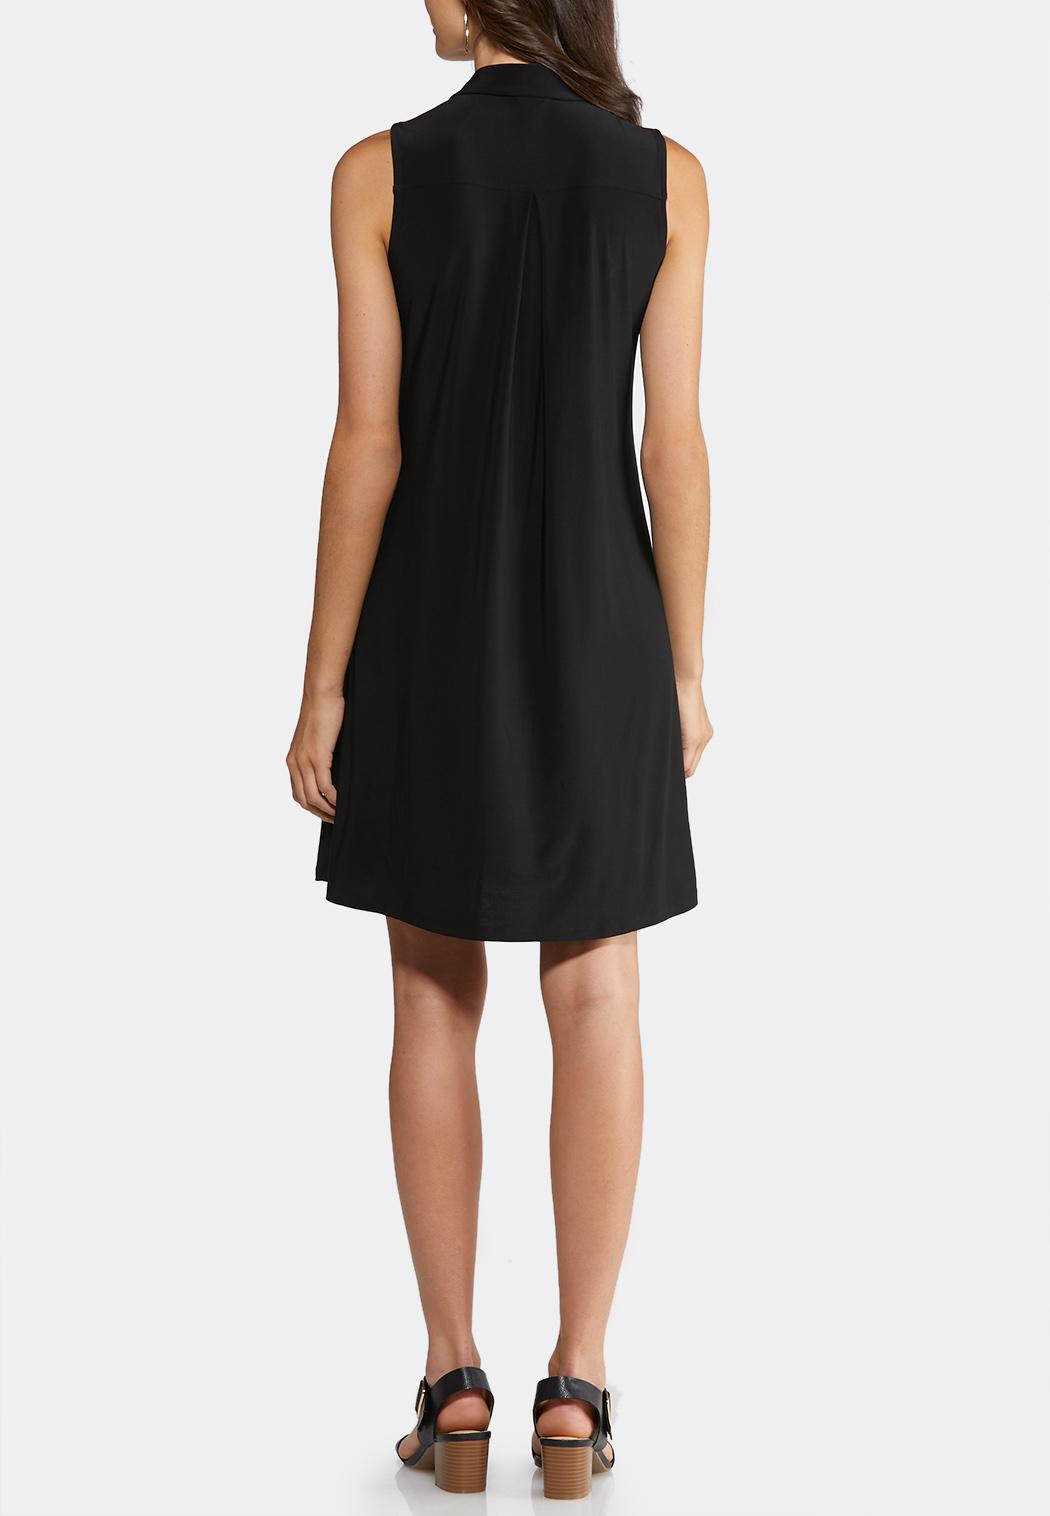 Swing Shirt Dress (Item #43875915)